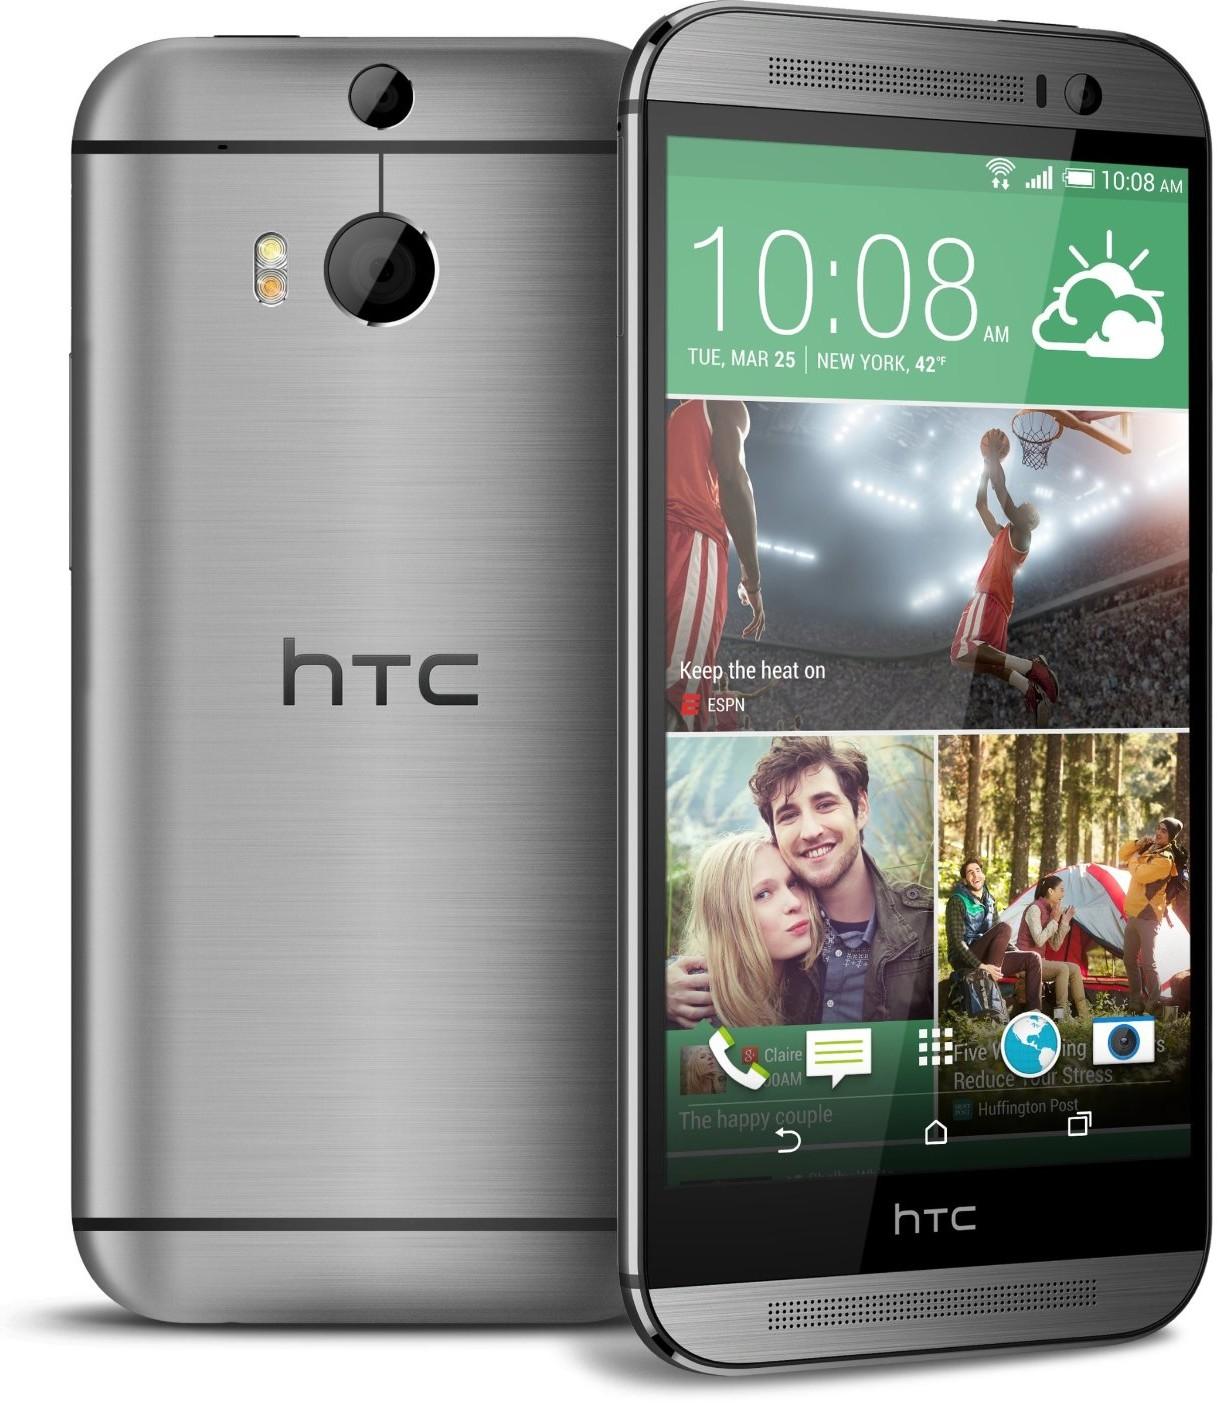 HTC One (M8) CDMA Sprint - Specs and Price - Phonegg